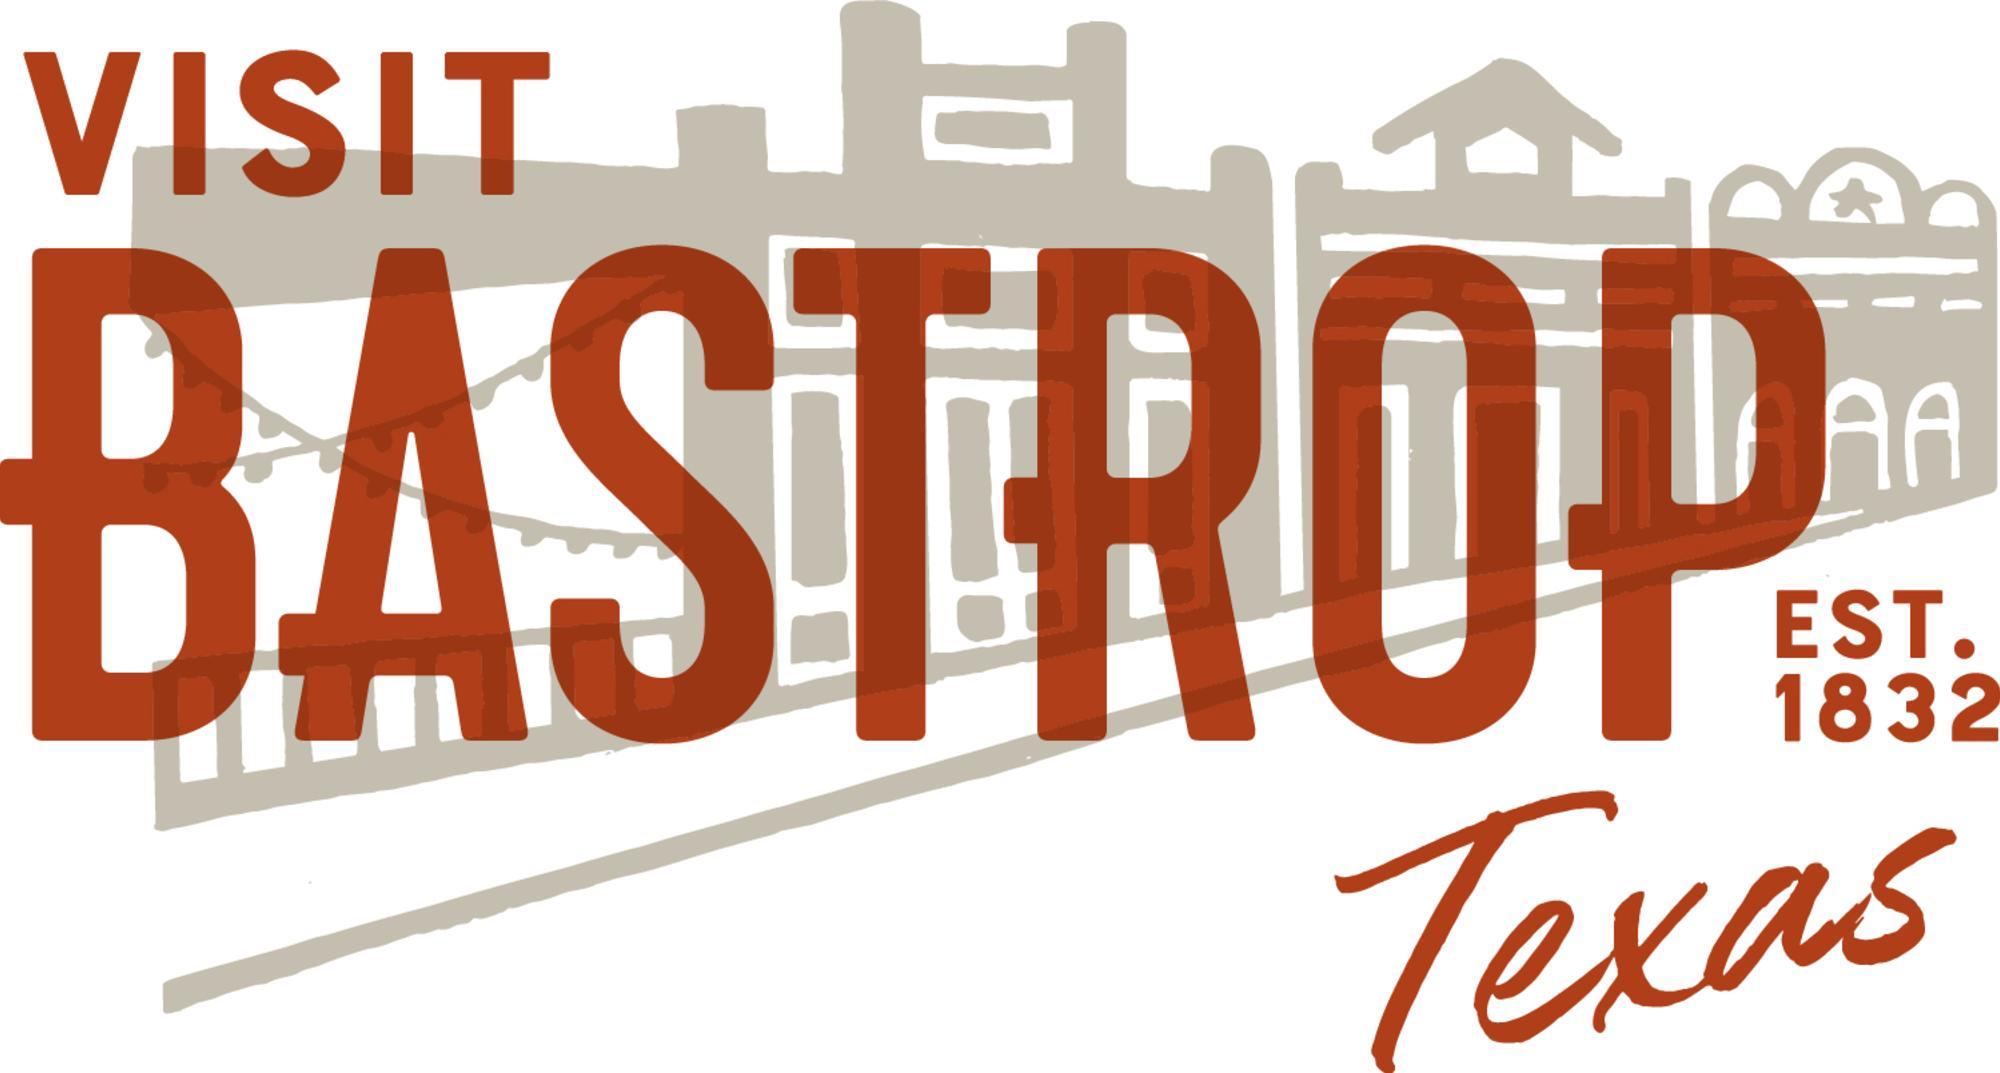 Visit Bastrop Logo (Downtown)